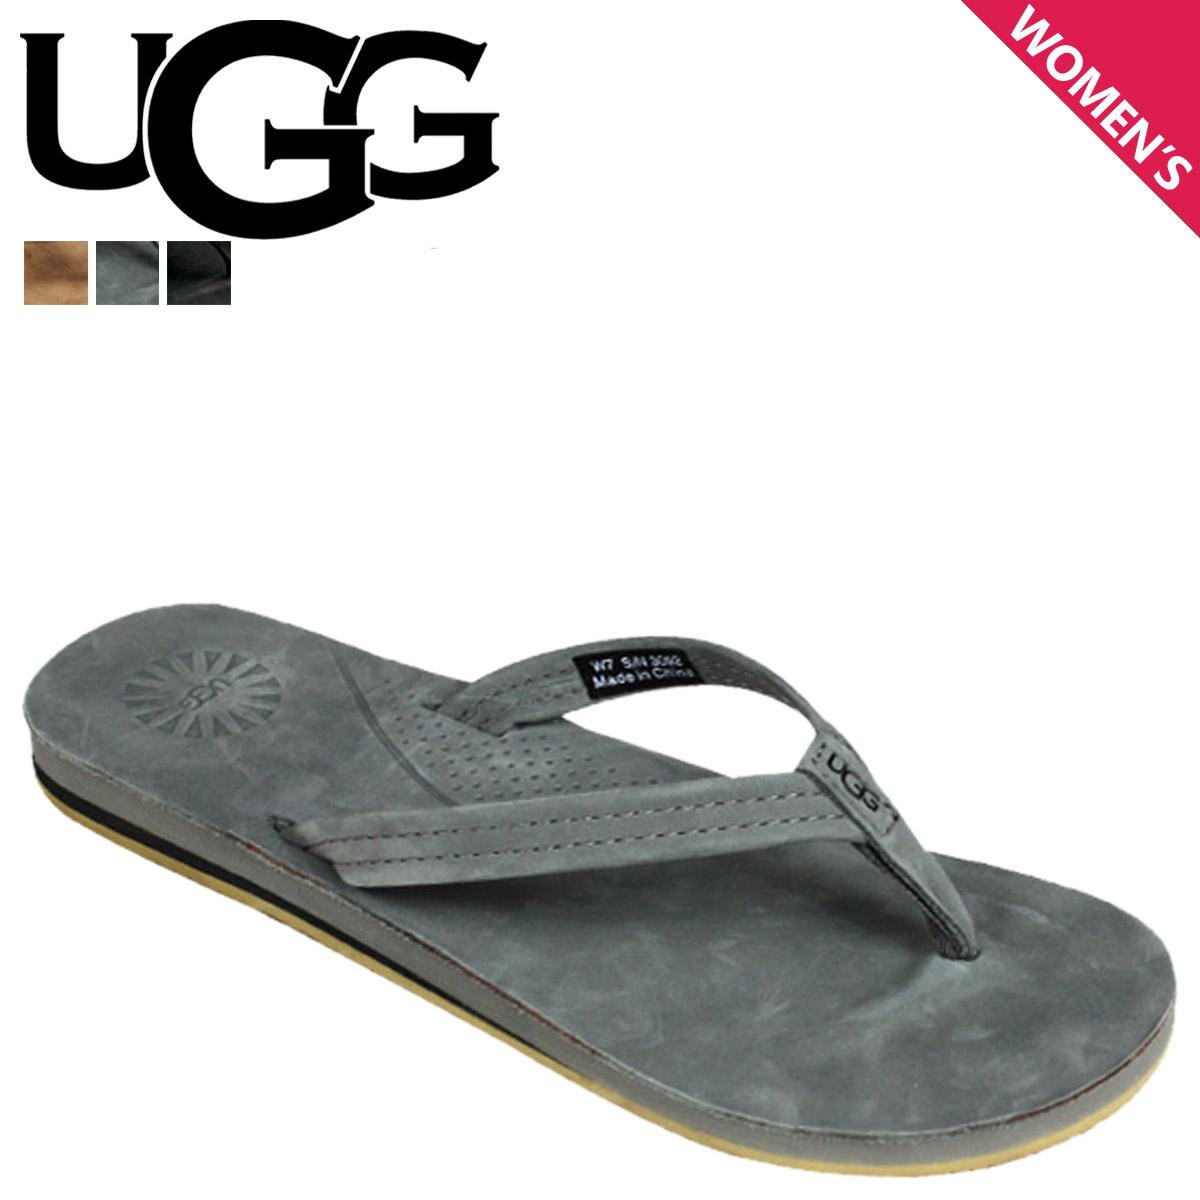 35d1c8b7bc7 UGG UGG women's Kayla Sandals [charcoal] 3092 WOMENS KAYLA nubuck women's  FALL 2013 new [12 / 14 new stock] [regular]